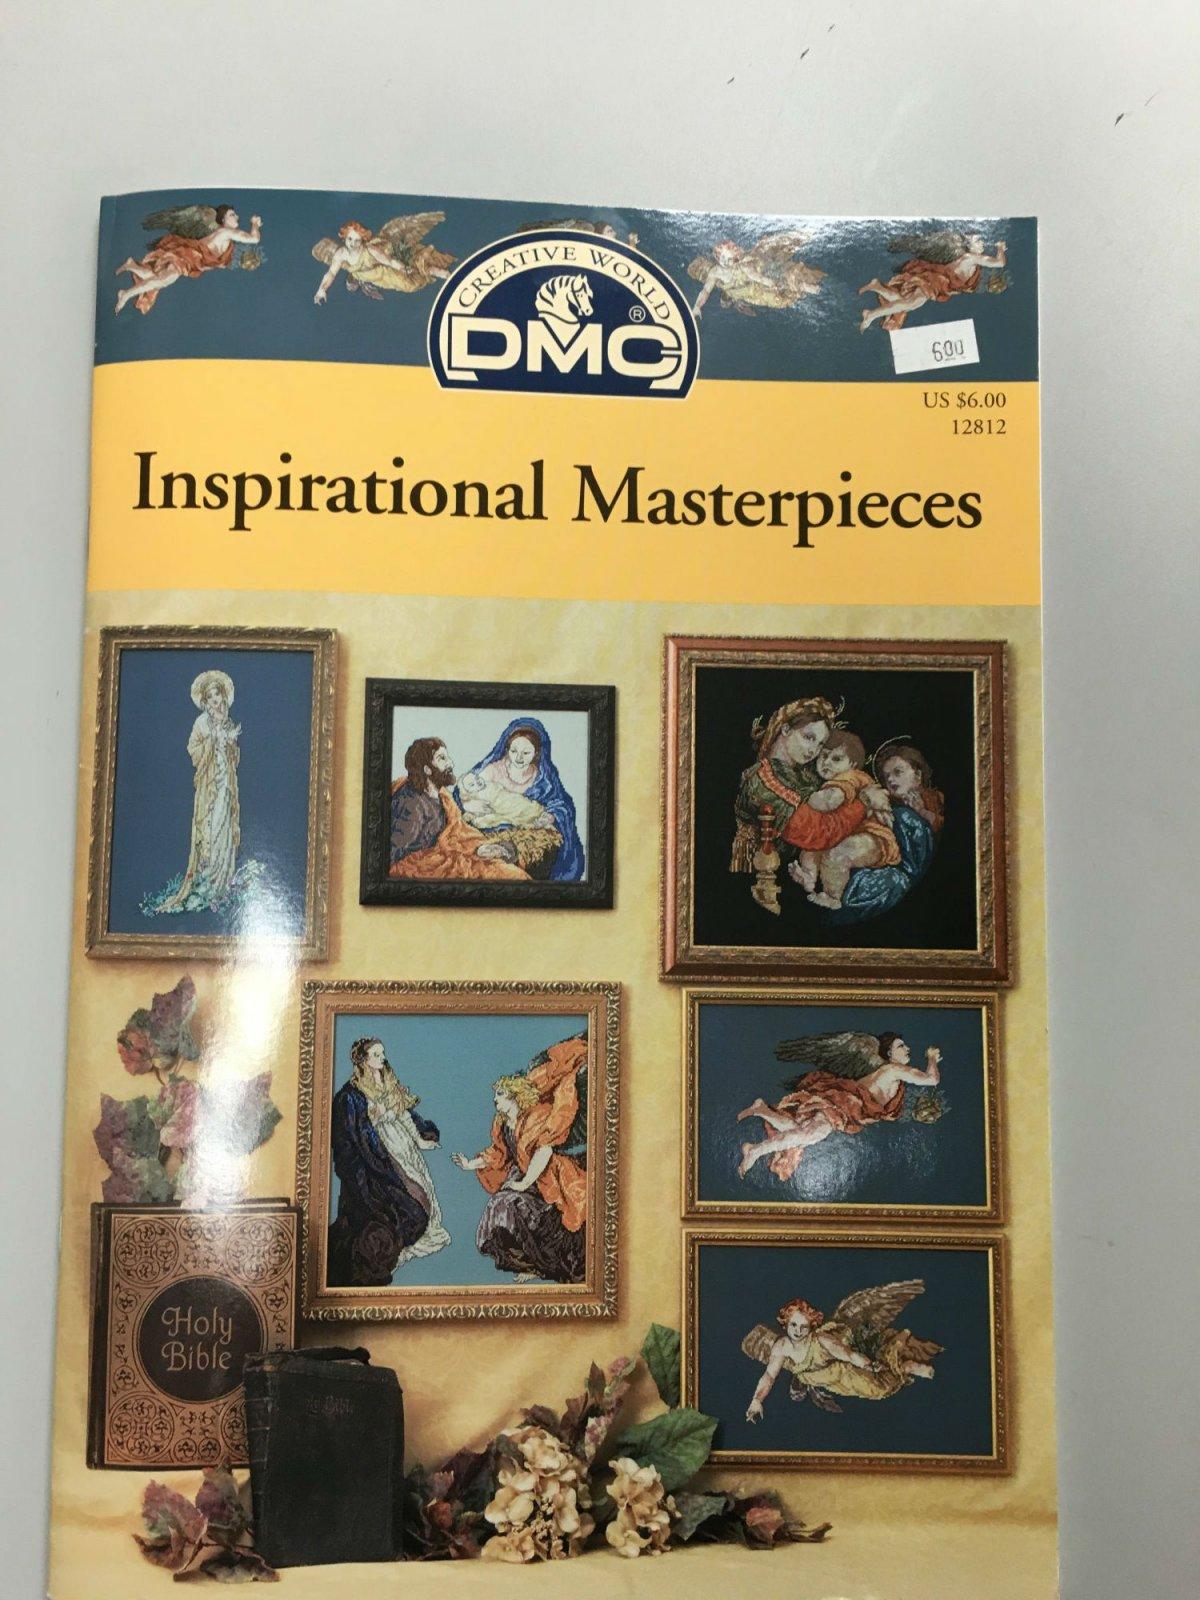 DMC Inspirational Masterpieces